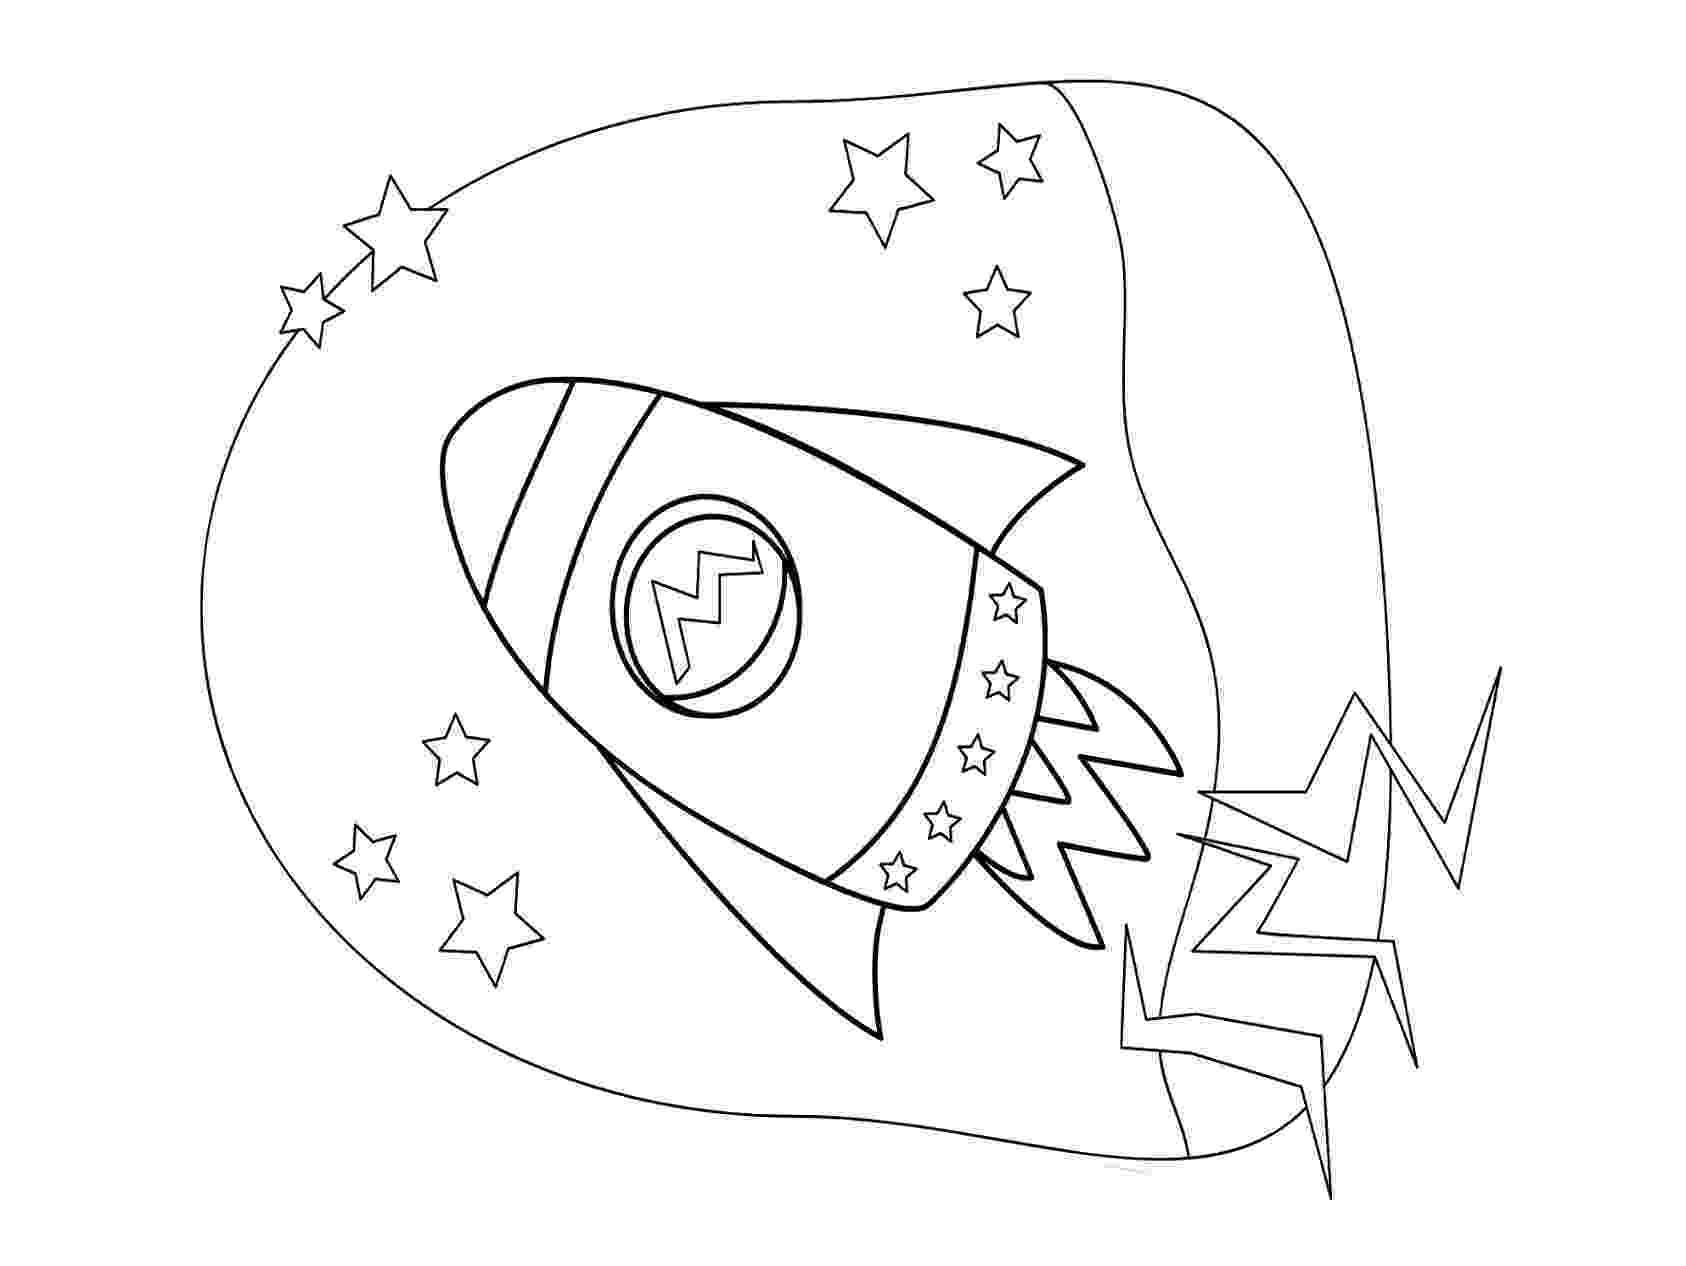 rocket ship coloring page printable rocket ship coloring pages for kids cool2bkids rocket page ship coloring